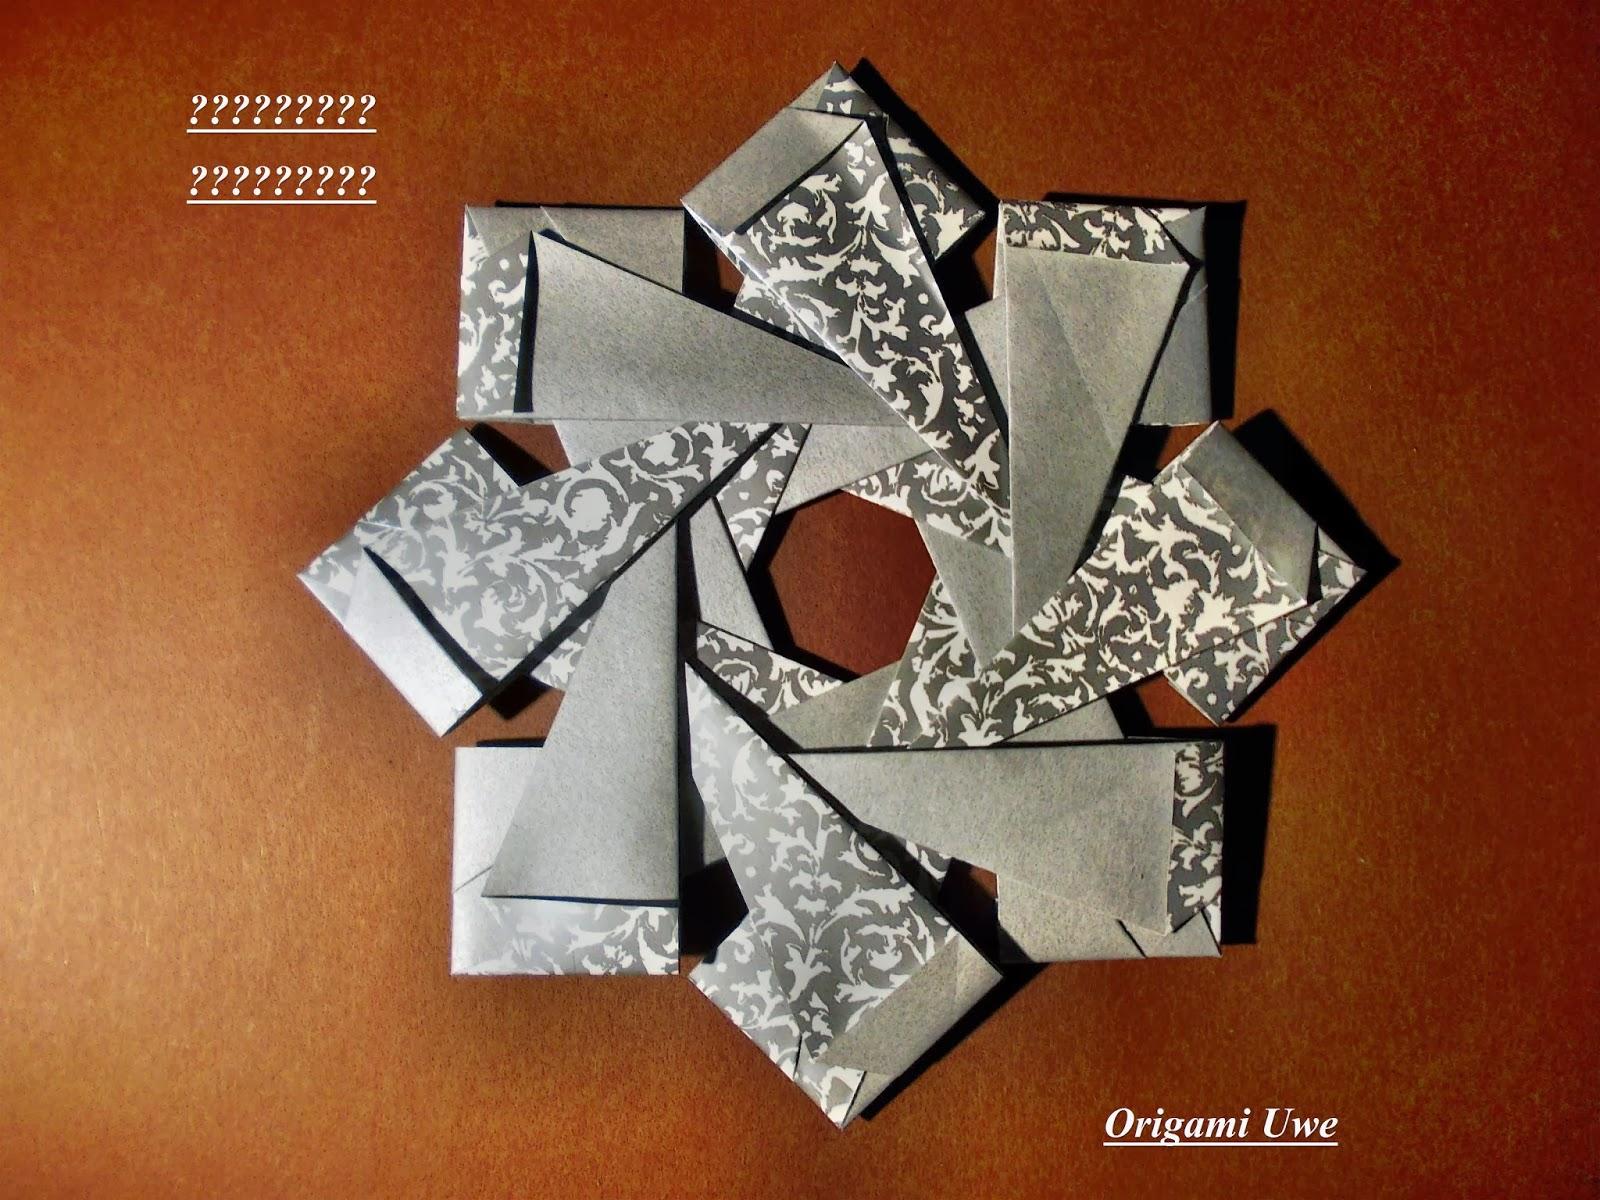 origami fleurogami und sterne sternen r228tsel puzzles stars